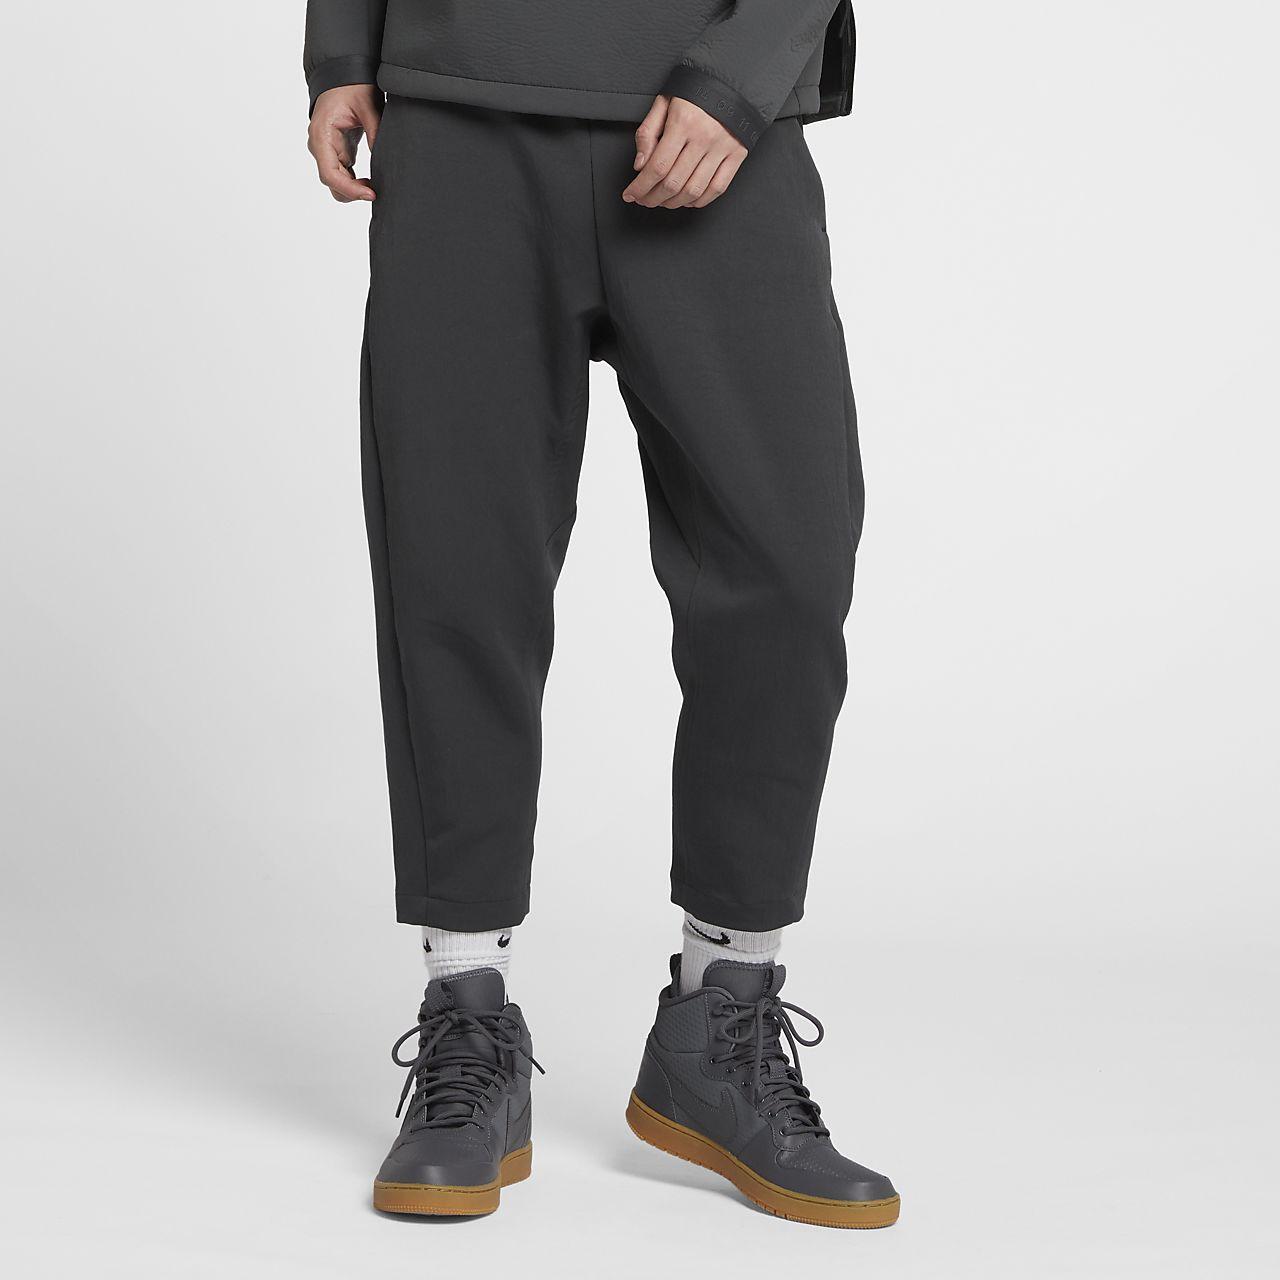 b44c80b59159 Nike Sportswear Tech Pack Men s Cropped Woven Trousers. Nike.com SG